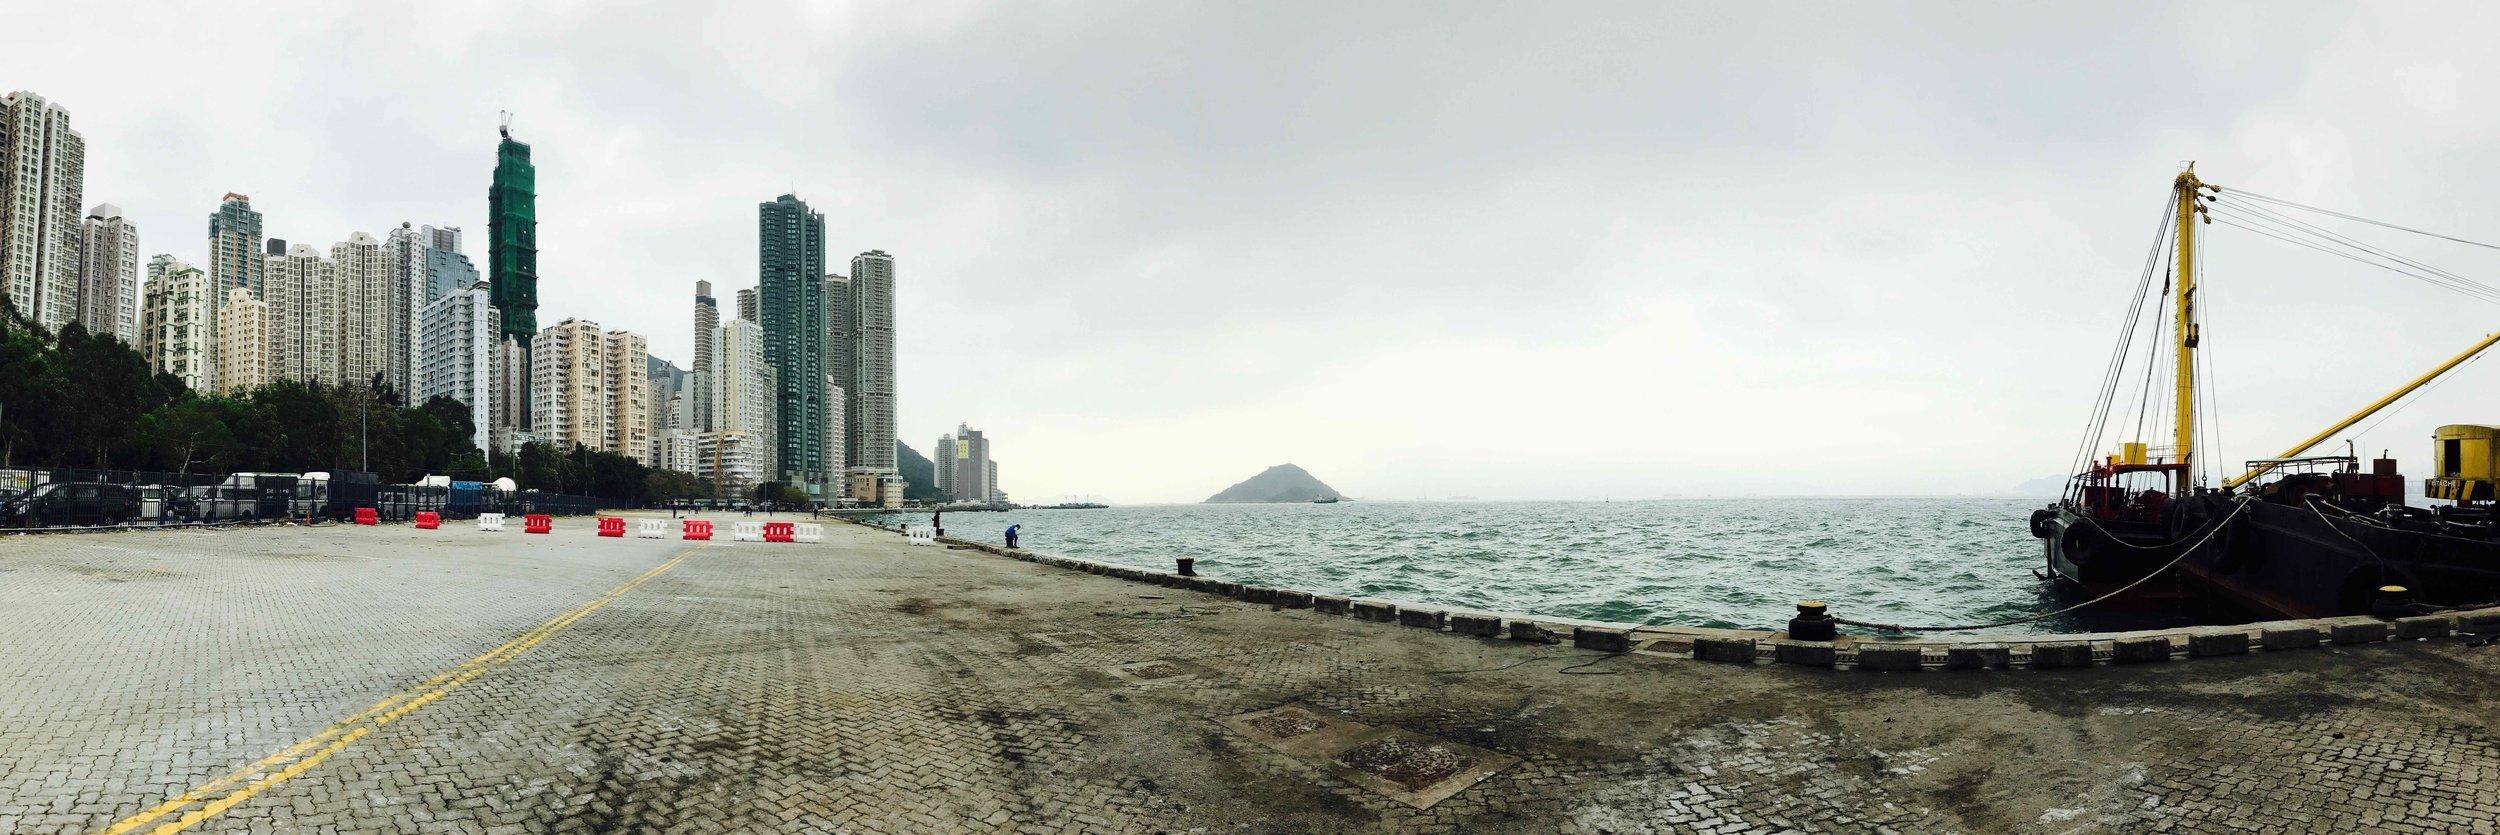 Instagram Pier